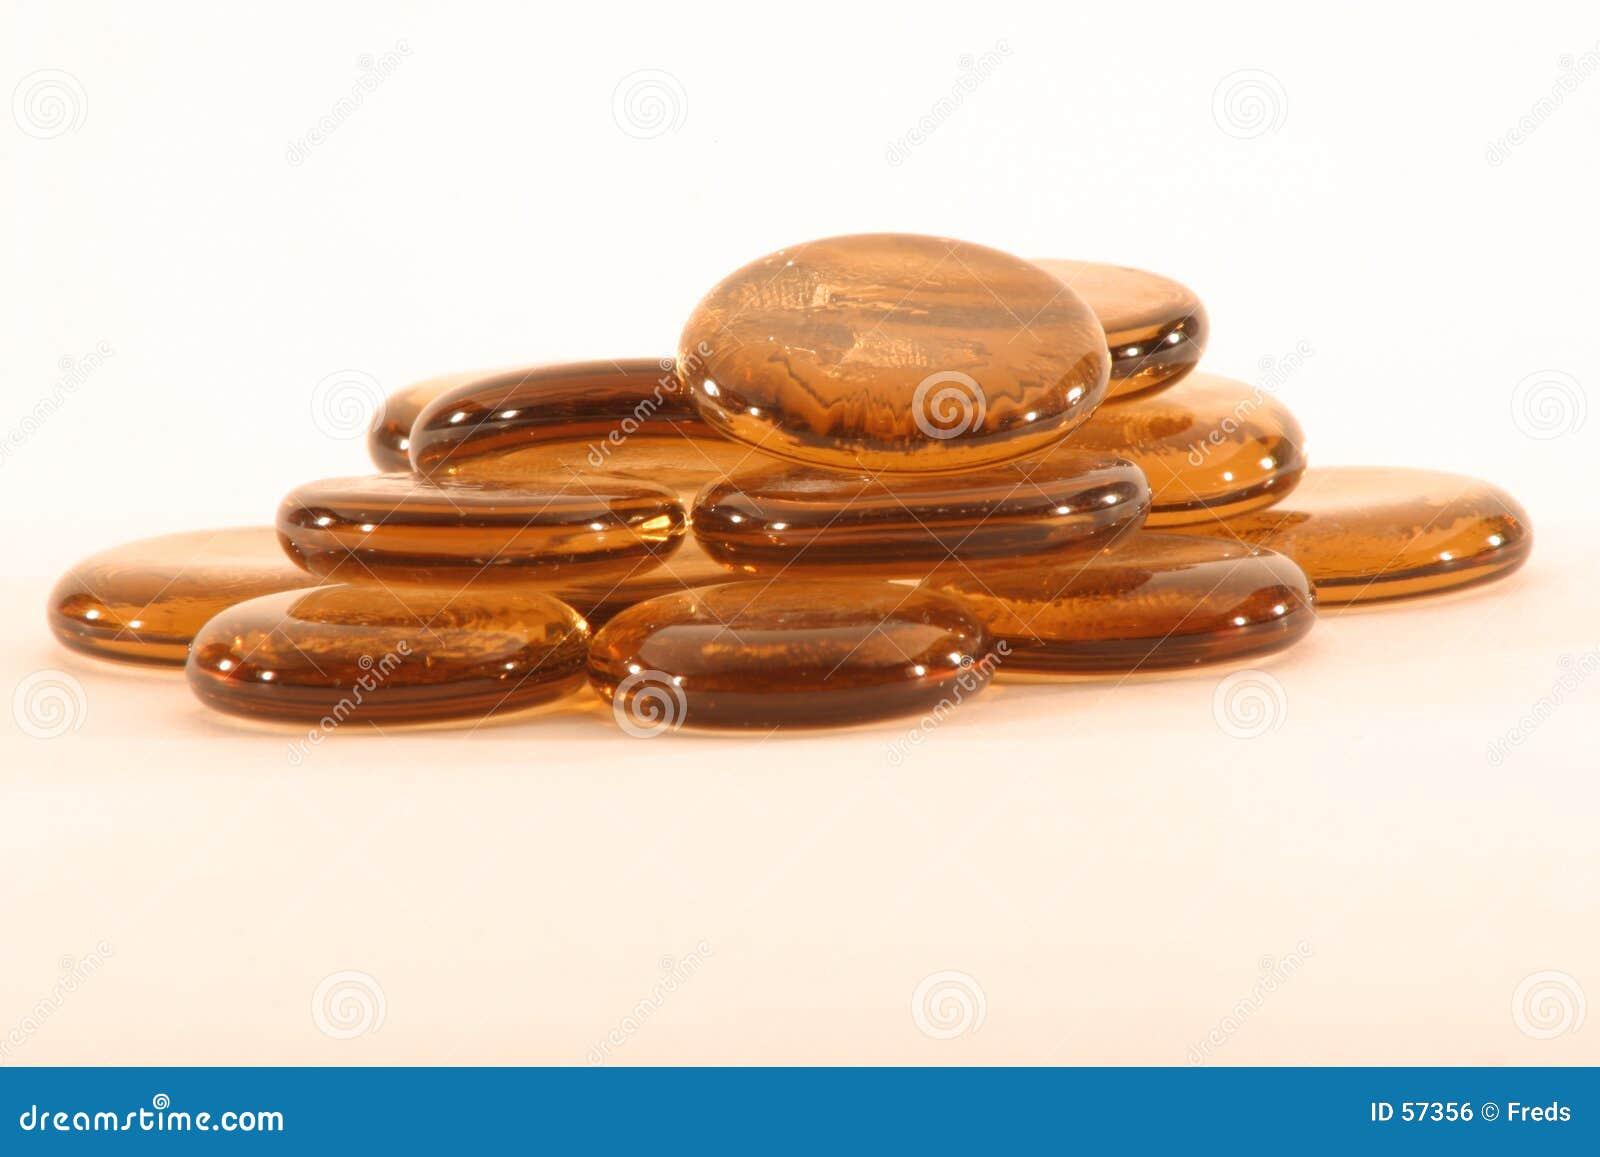 Download πέτρες χαλκού στοκ εικόνες. εικόνα από χαλκός, διαφανής - 57356